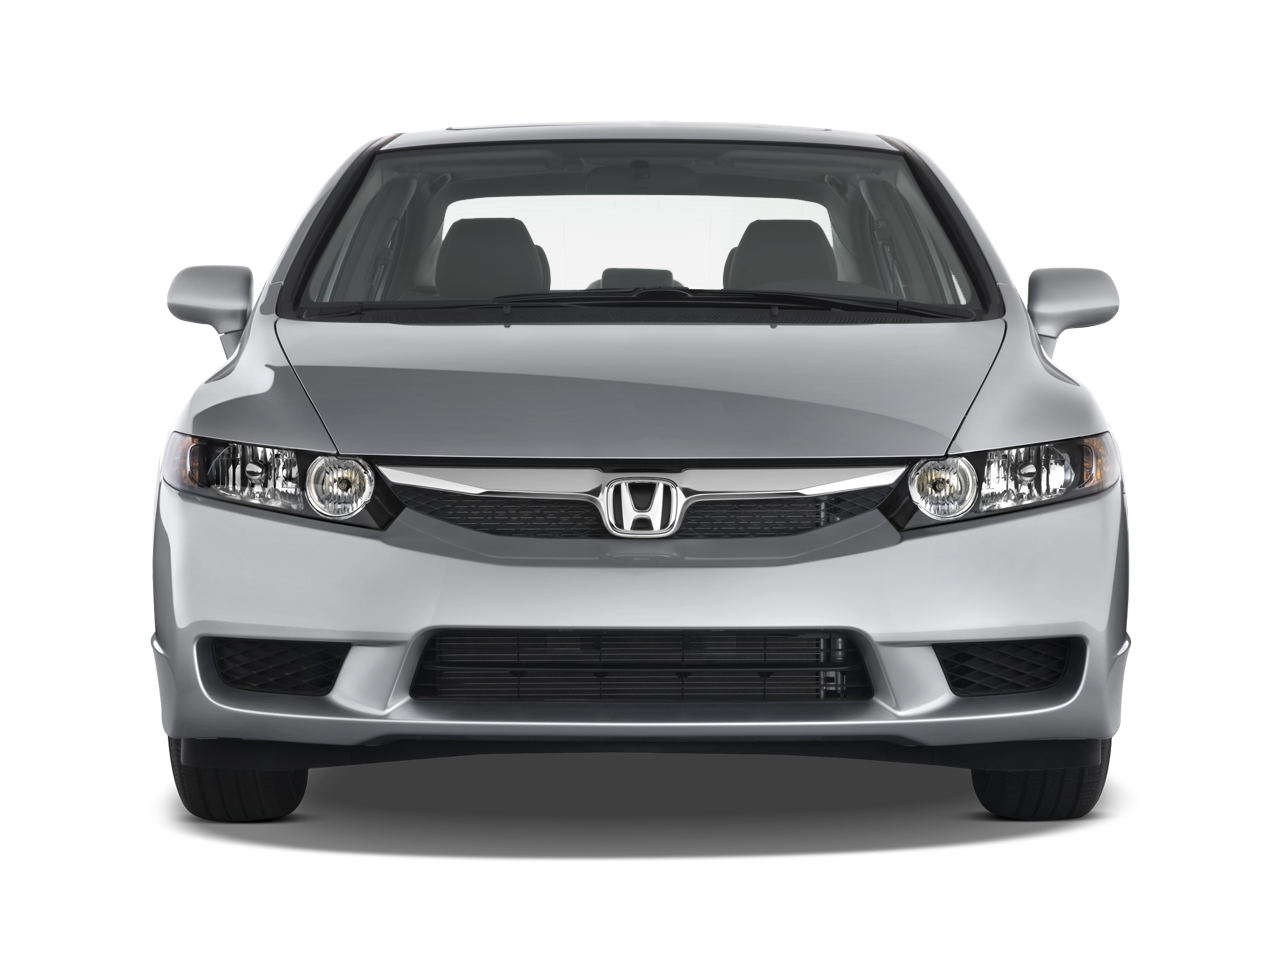 2009 honda civic si coupe honda sport coupe review automobile magazine. Black Bedroom Furniture Sets. Home Design Ideas